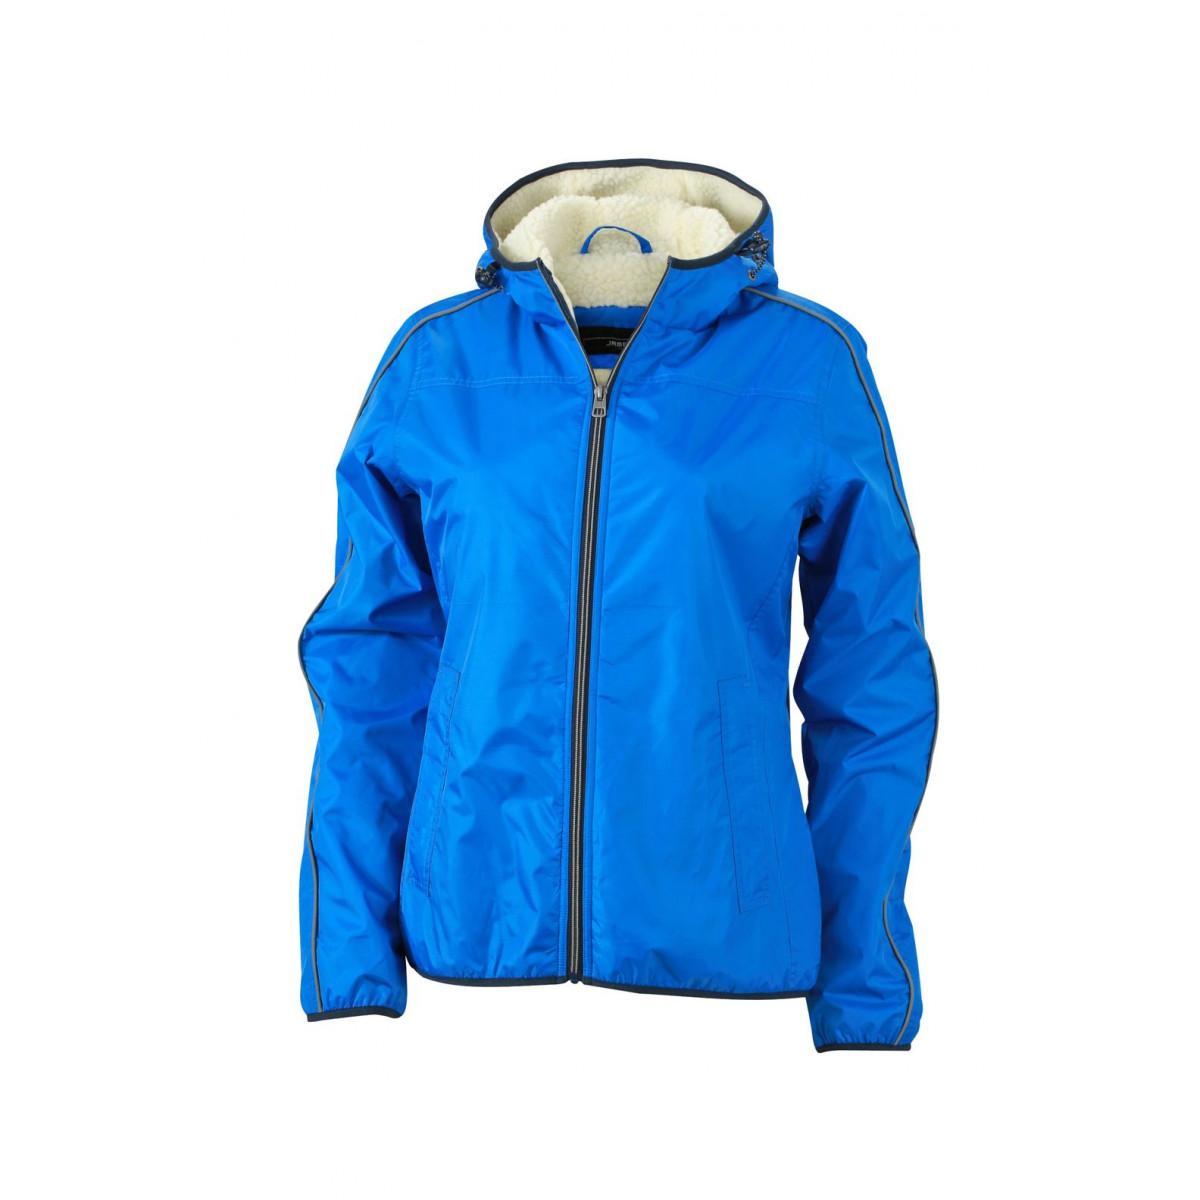 Куртка женская JN1103 Ladies Winter Sports Jacket - Ярко-синий/Белый